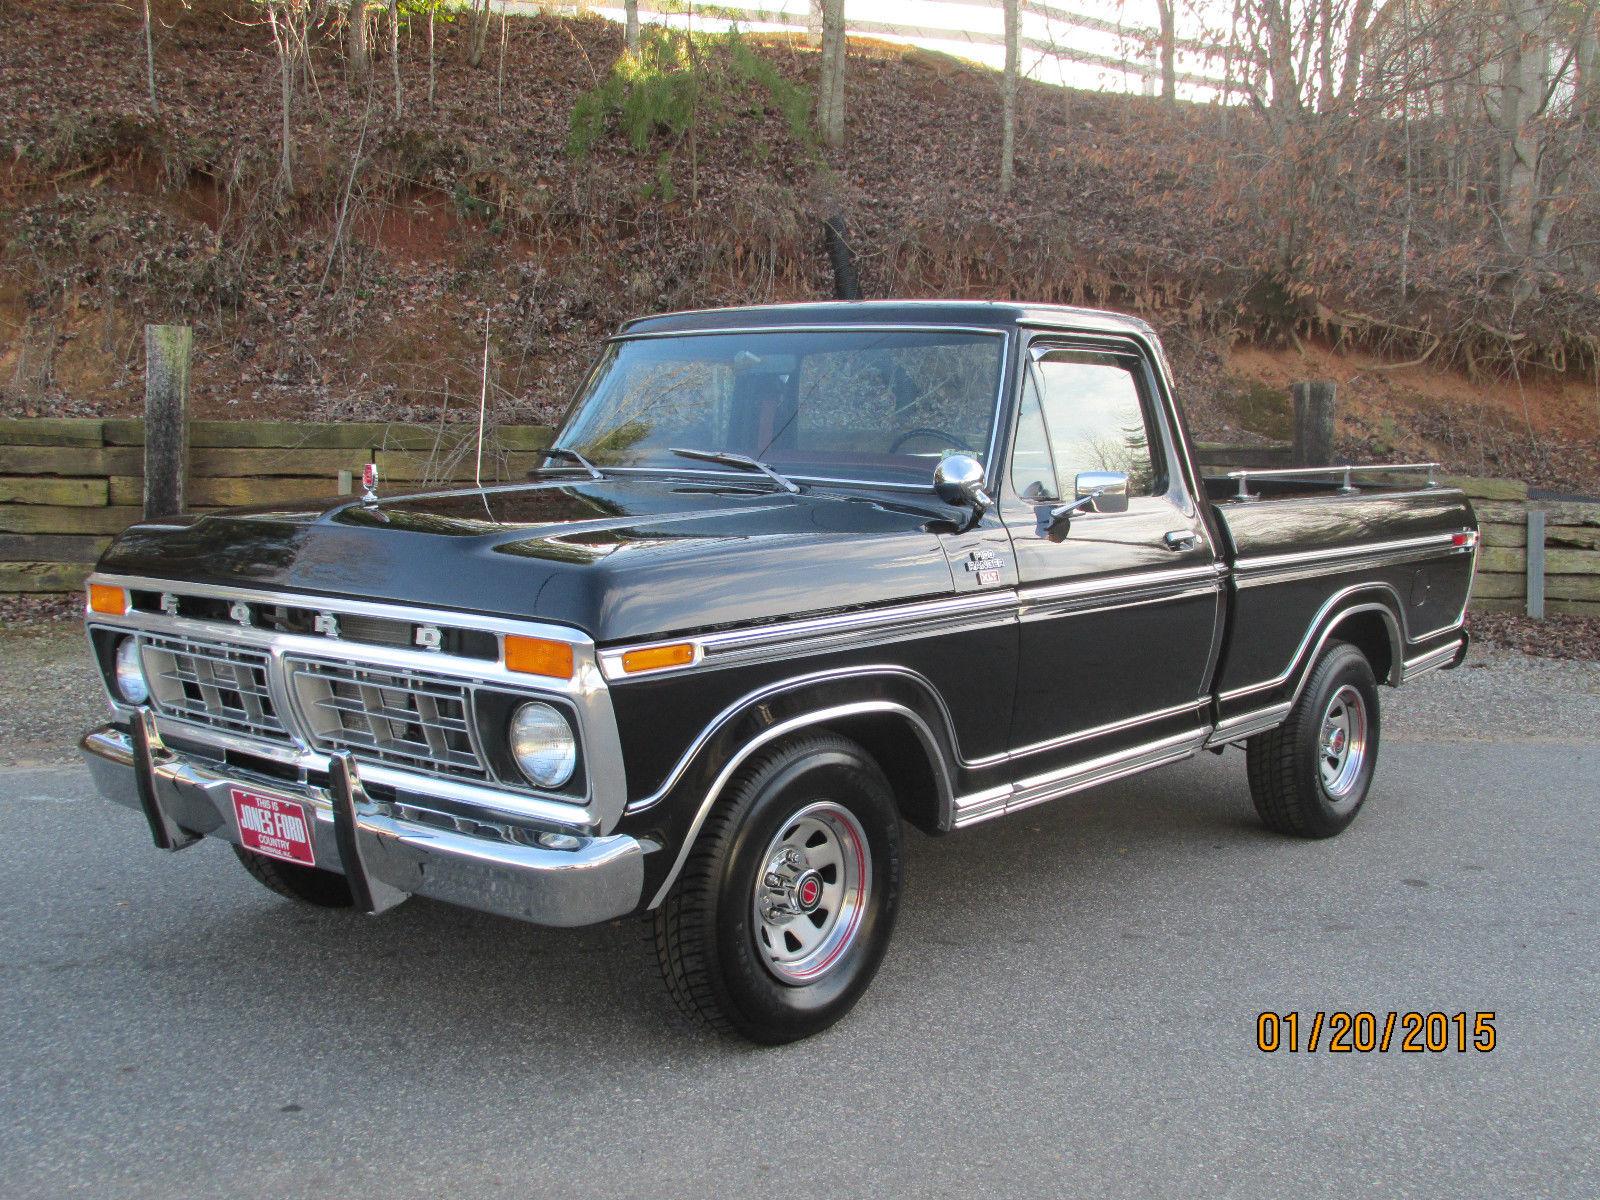 1977 ford ranger xlt f100 black 40k miles for sale in wilkesboro north carolina united states. Black Bedroom Furniture Sets. Home Design Ideas